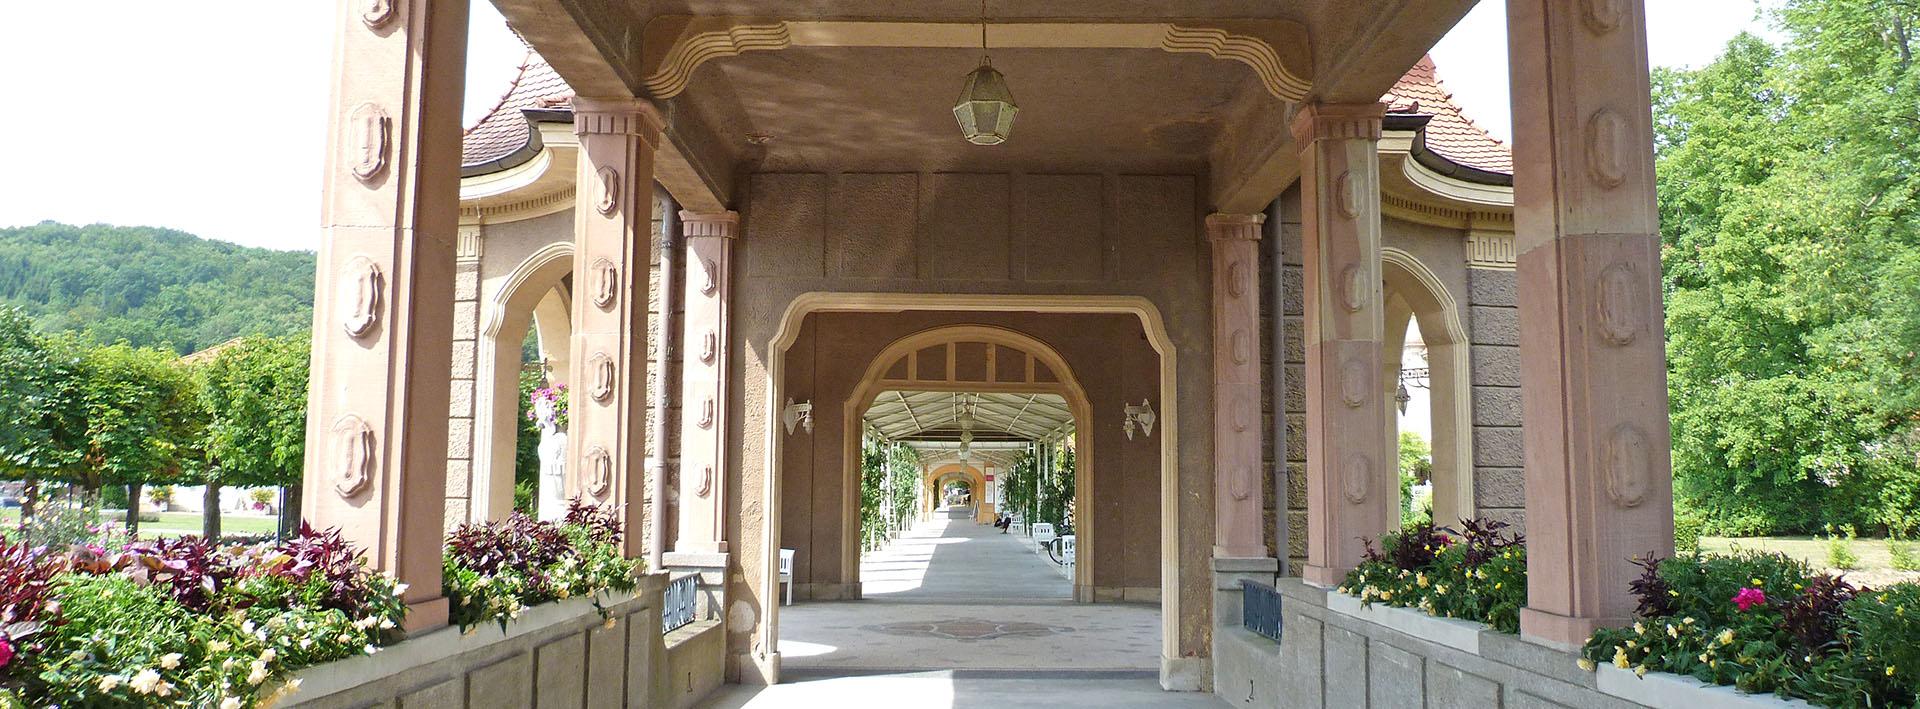 Historisches Palais Bad Brückenau